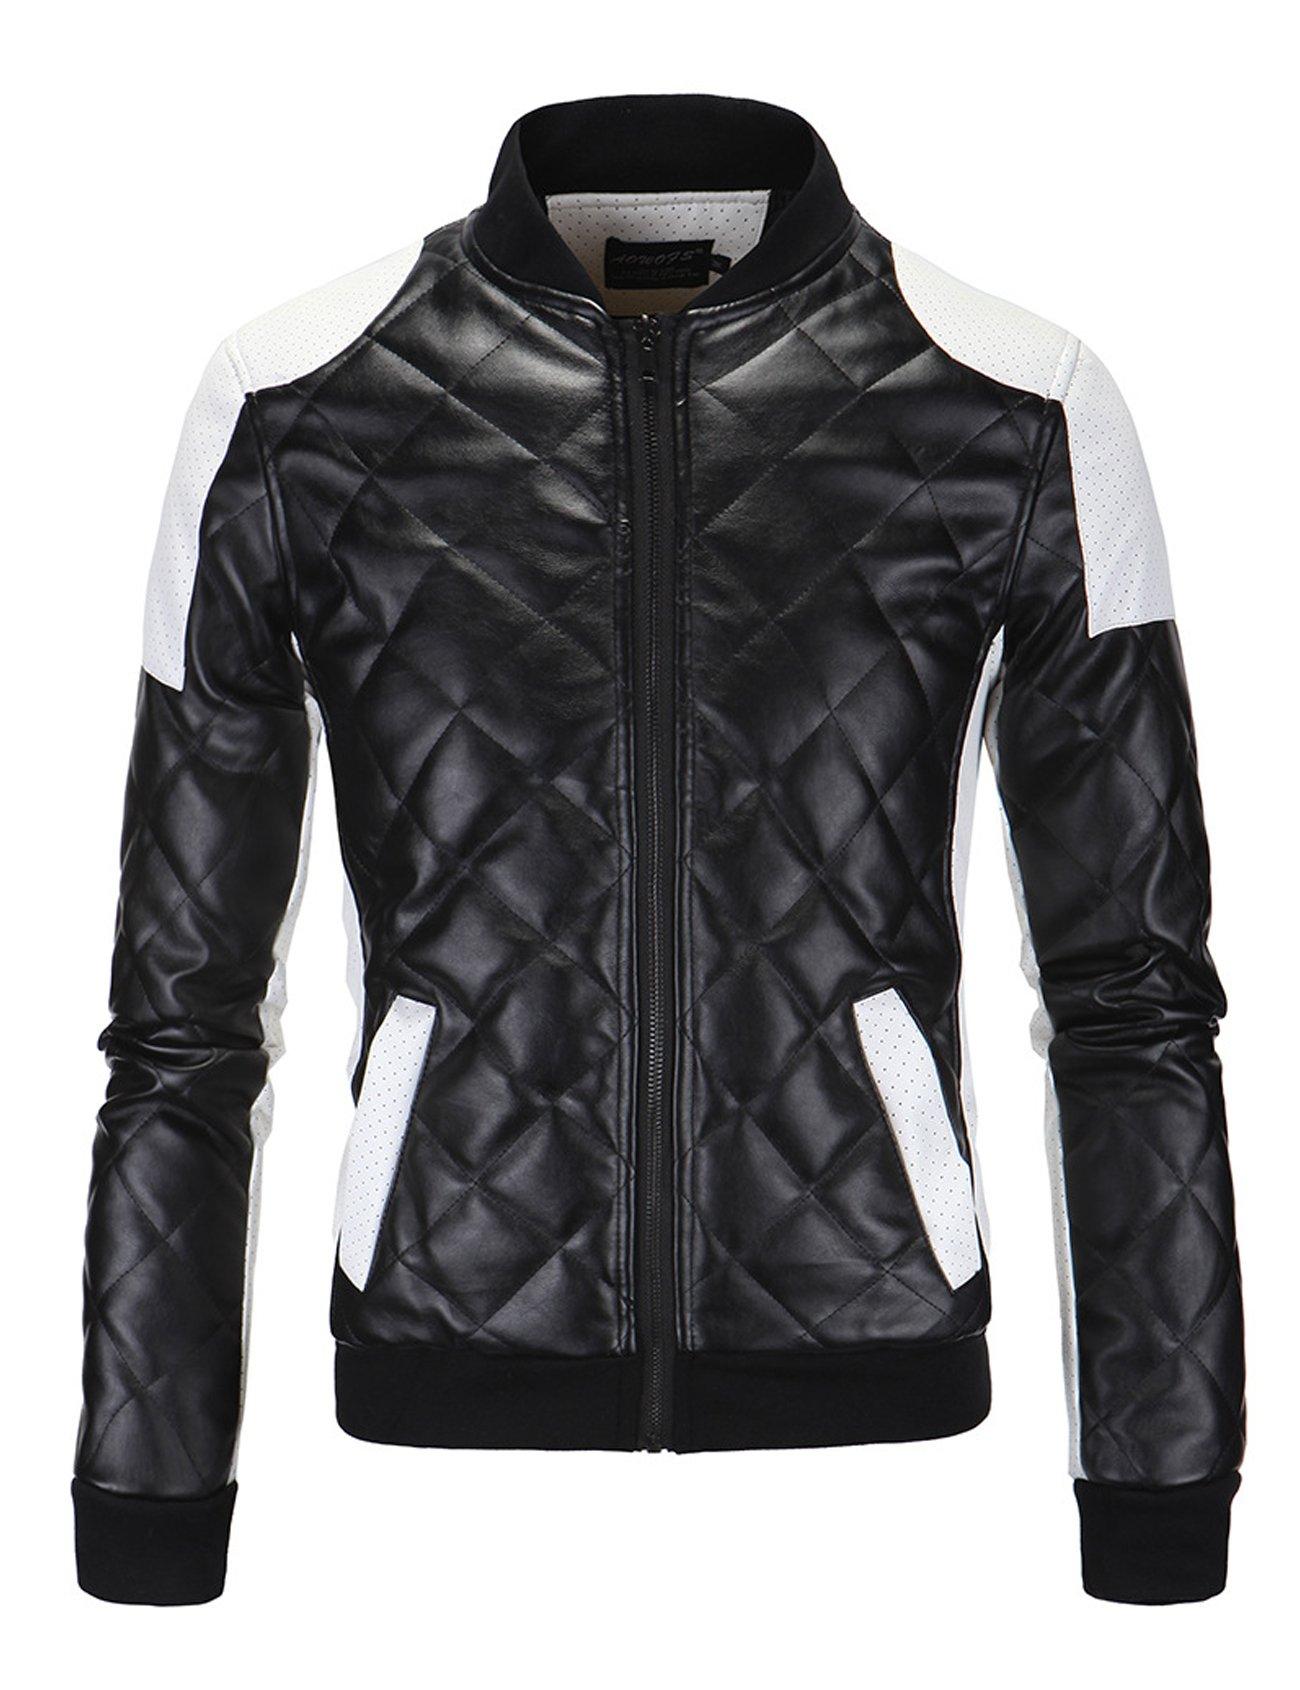 Letuwj Mens Bomber Jacket Stand Collar PU Leather Coat Black X-Large